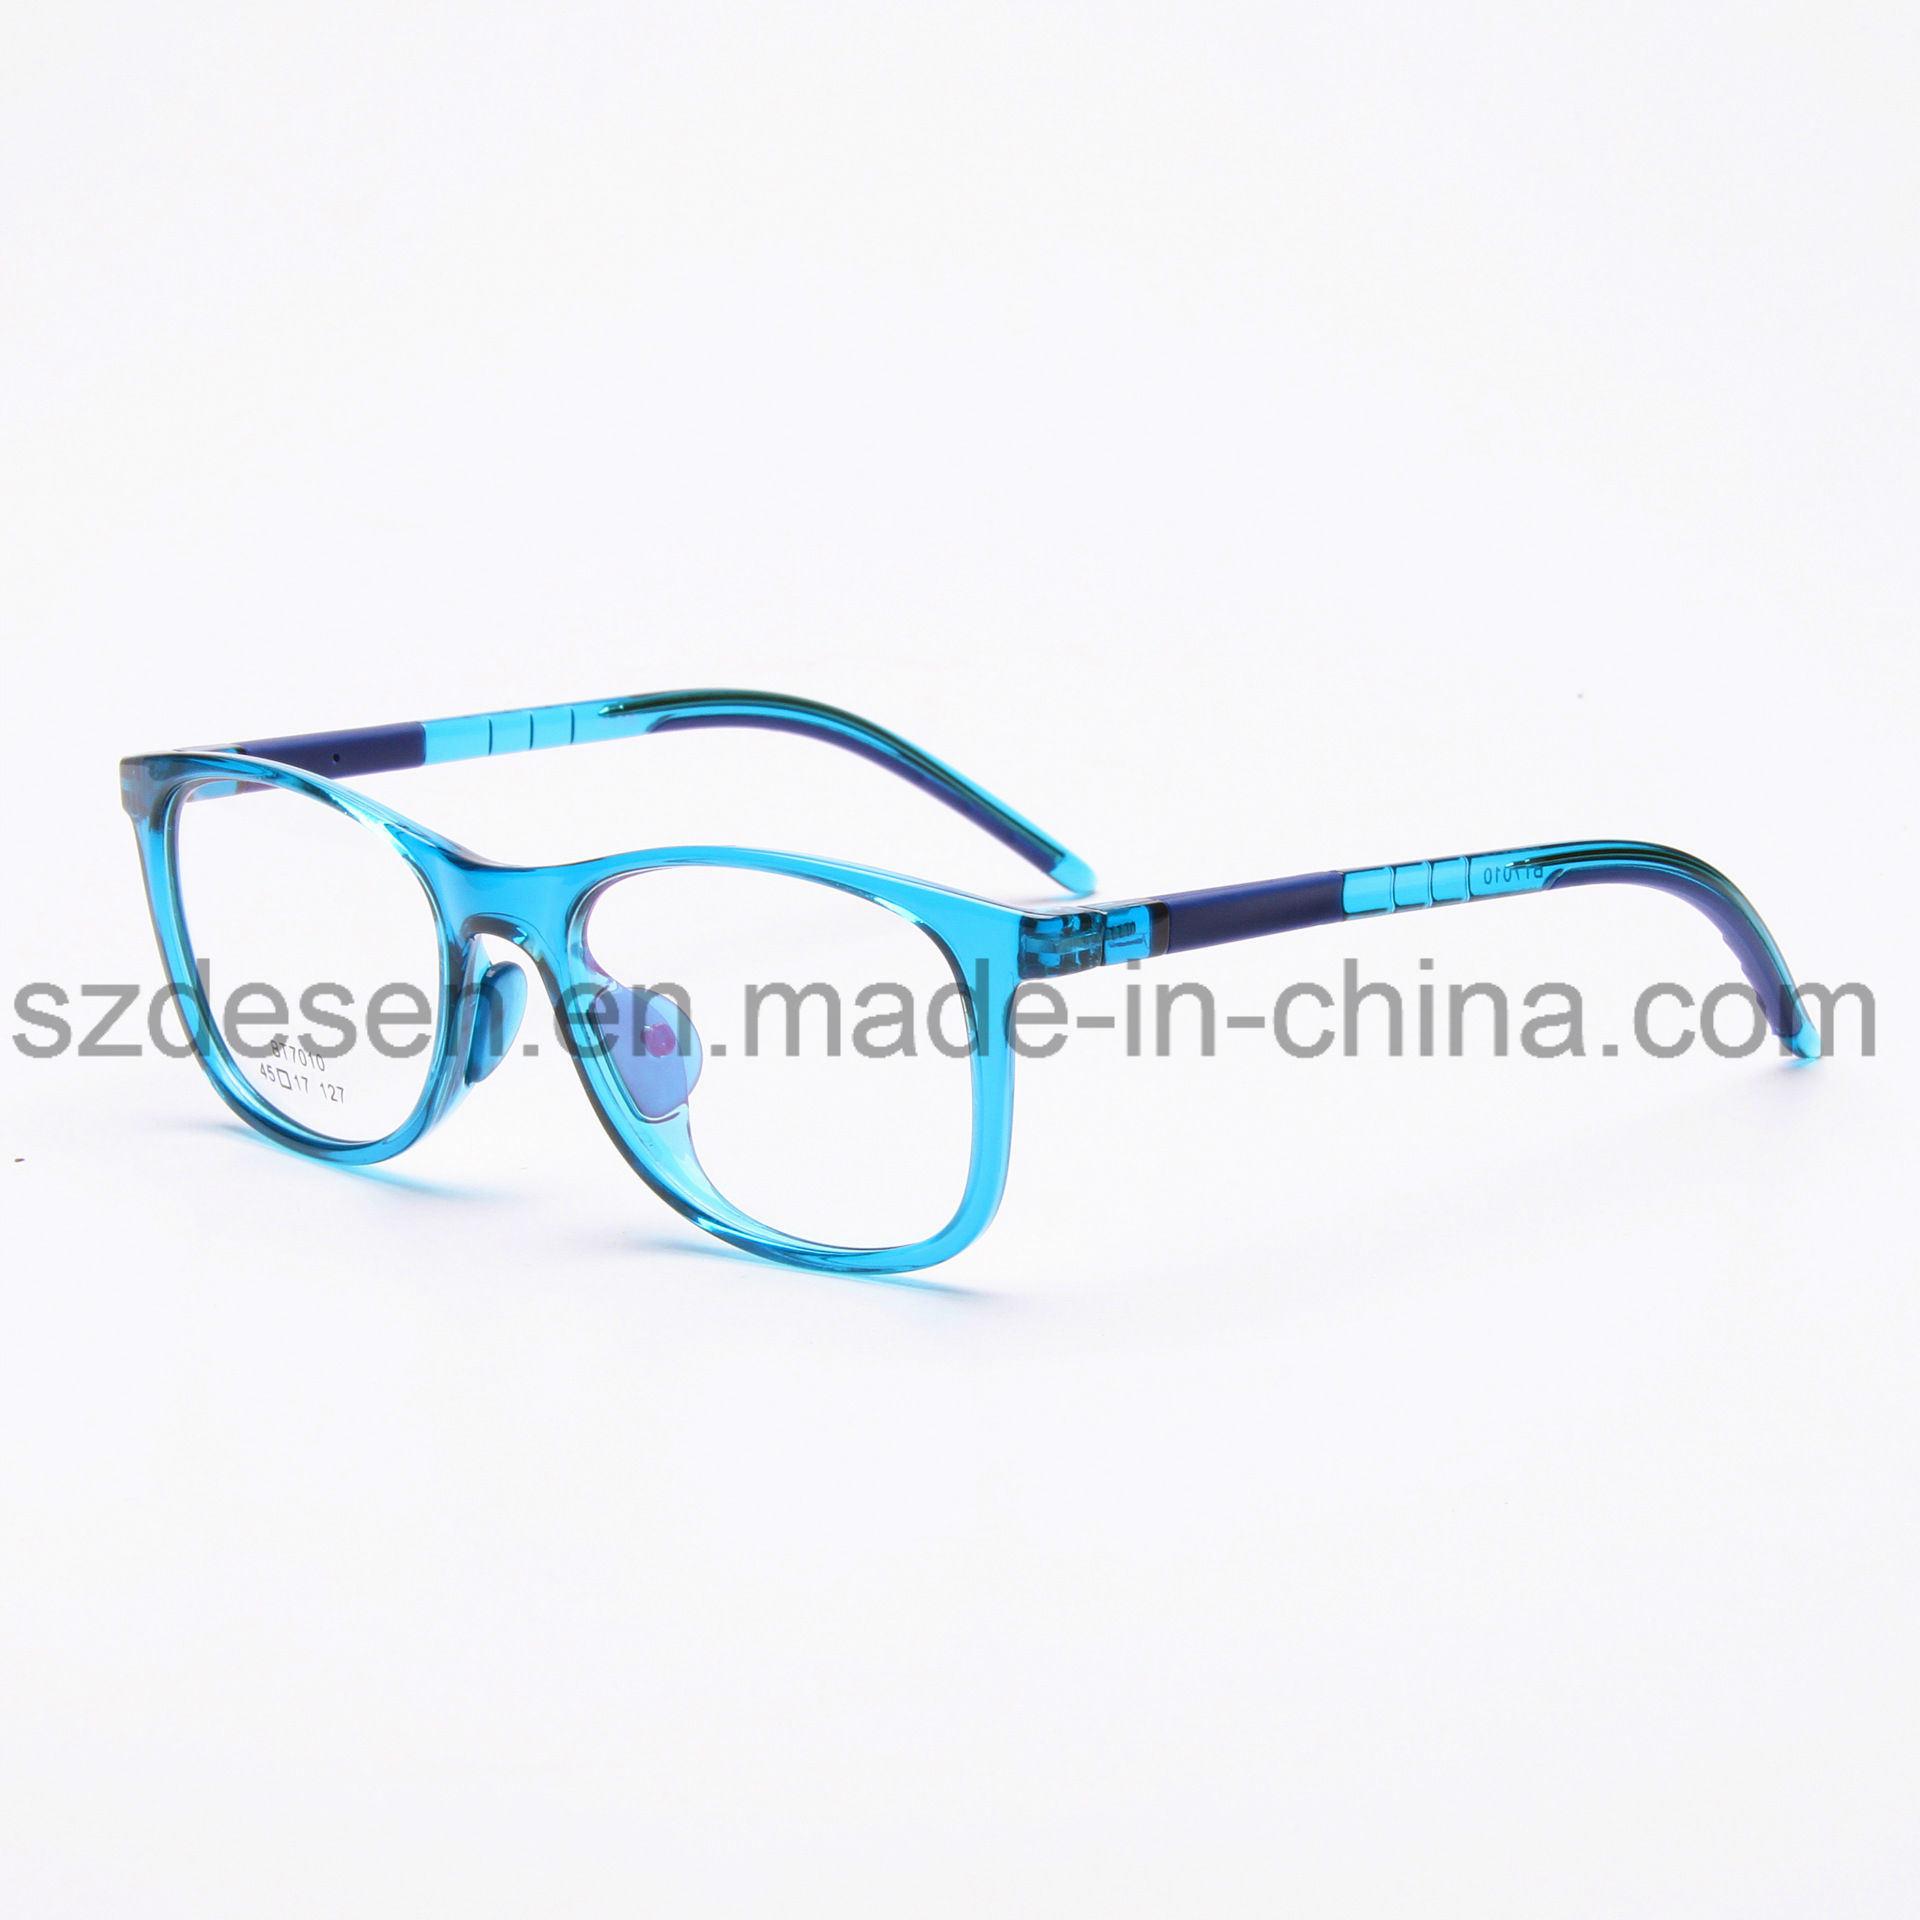 71fd7a1ada7 China Low Price Wholesale Full Rim Tr90 Kids Eyewear Optical Frames - China  Glasses